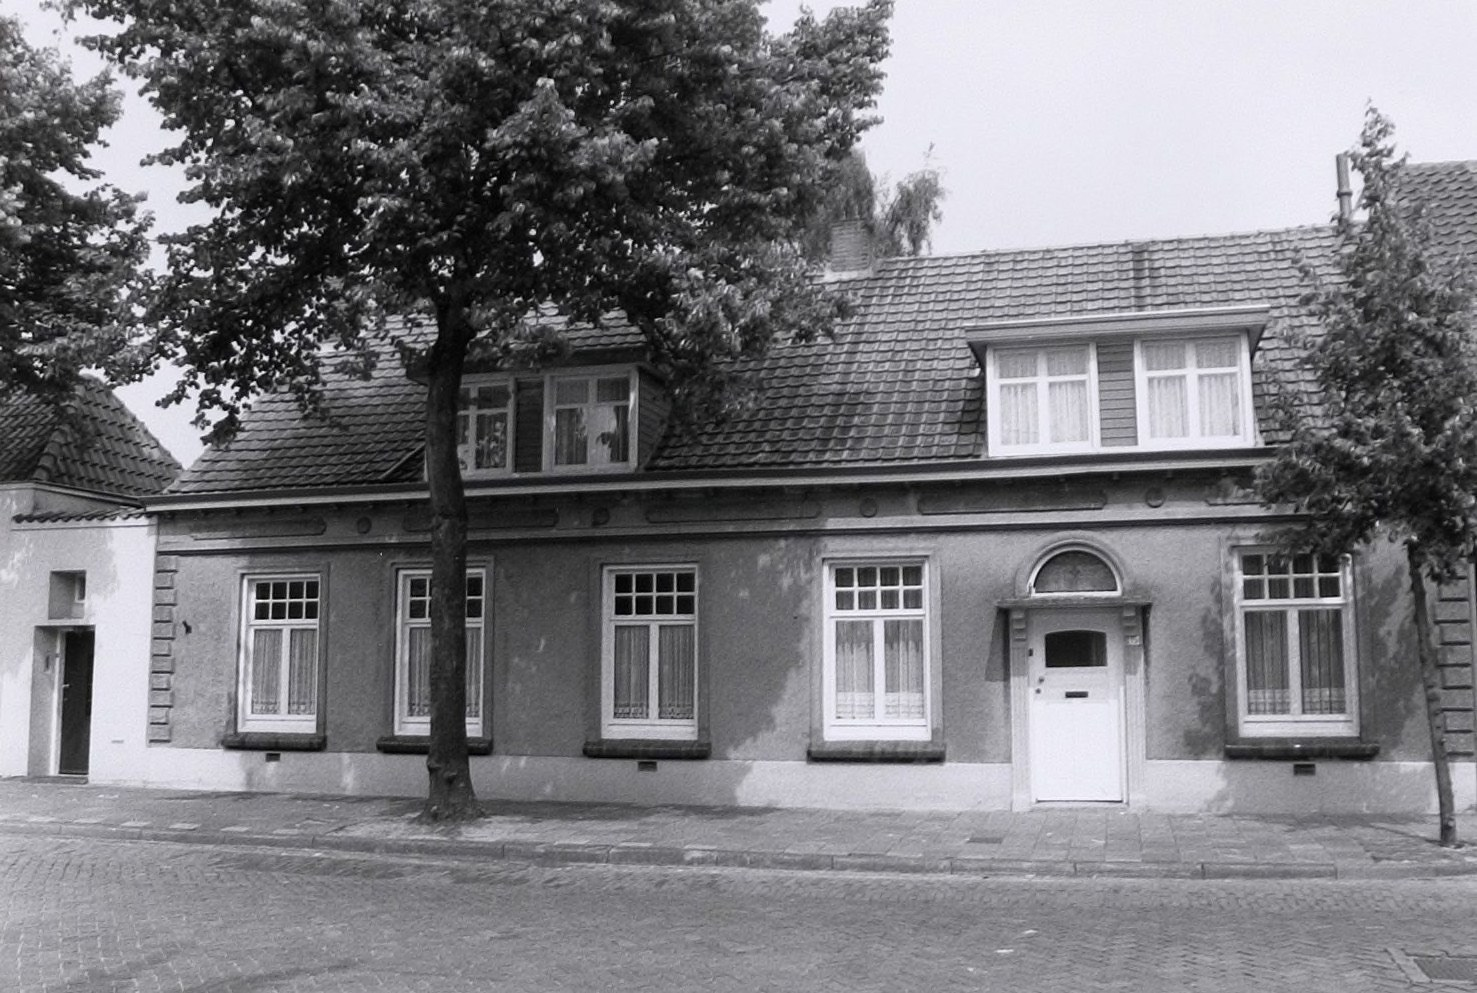 Datering 1990. kerkstraat-13